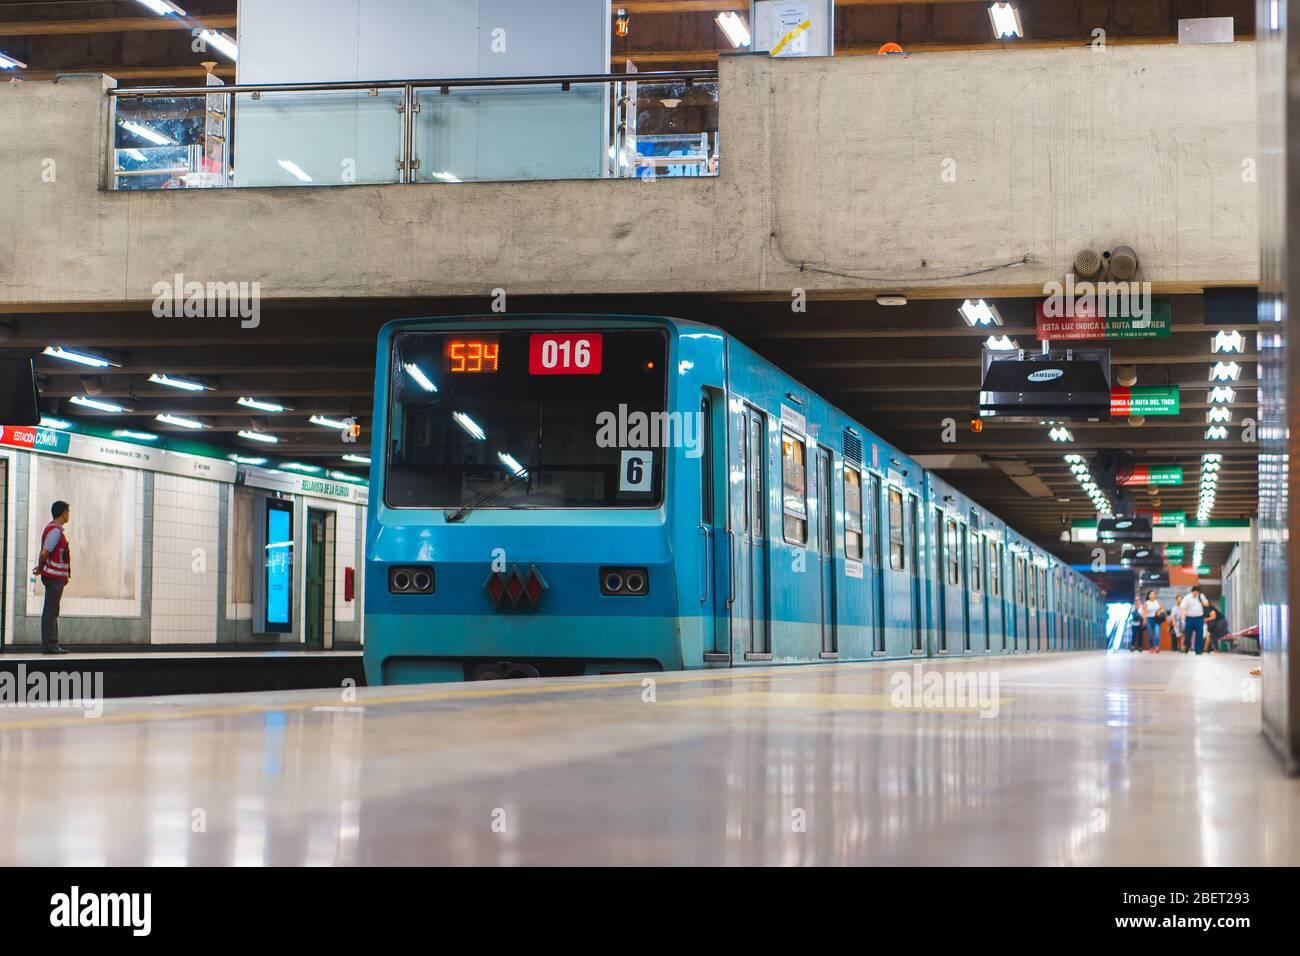 Santiago Chile January 2020 A Metro De Santiago Train At Line 5 Stock Photo Alamy